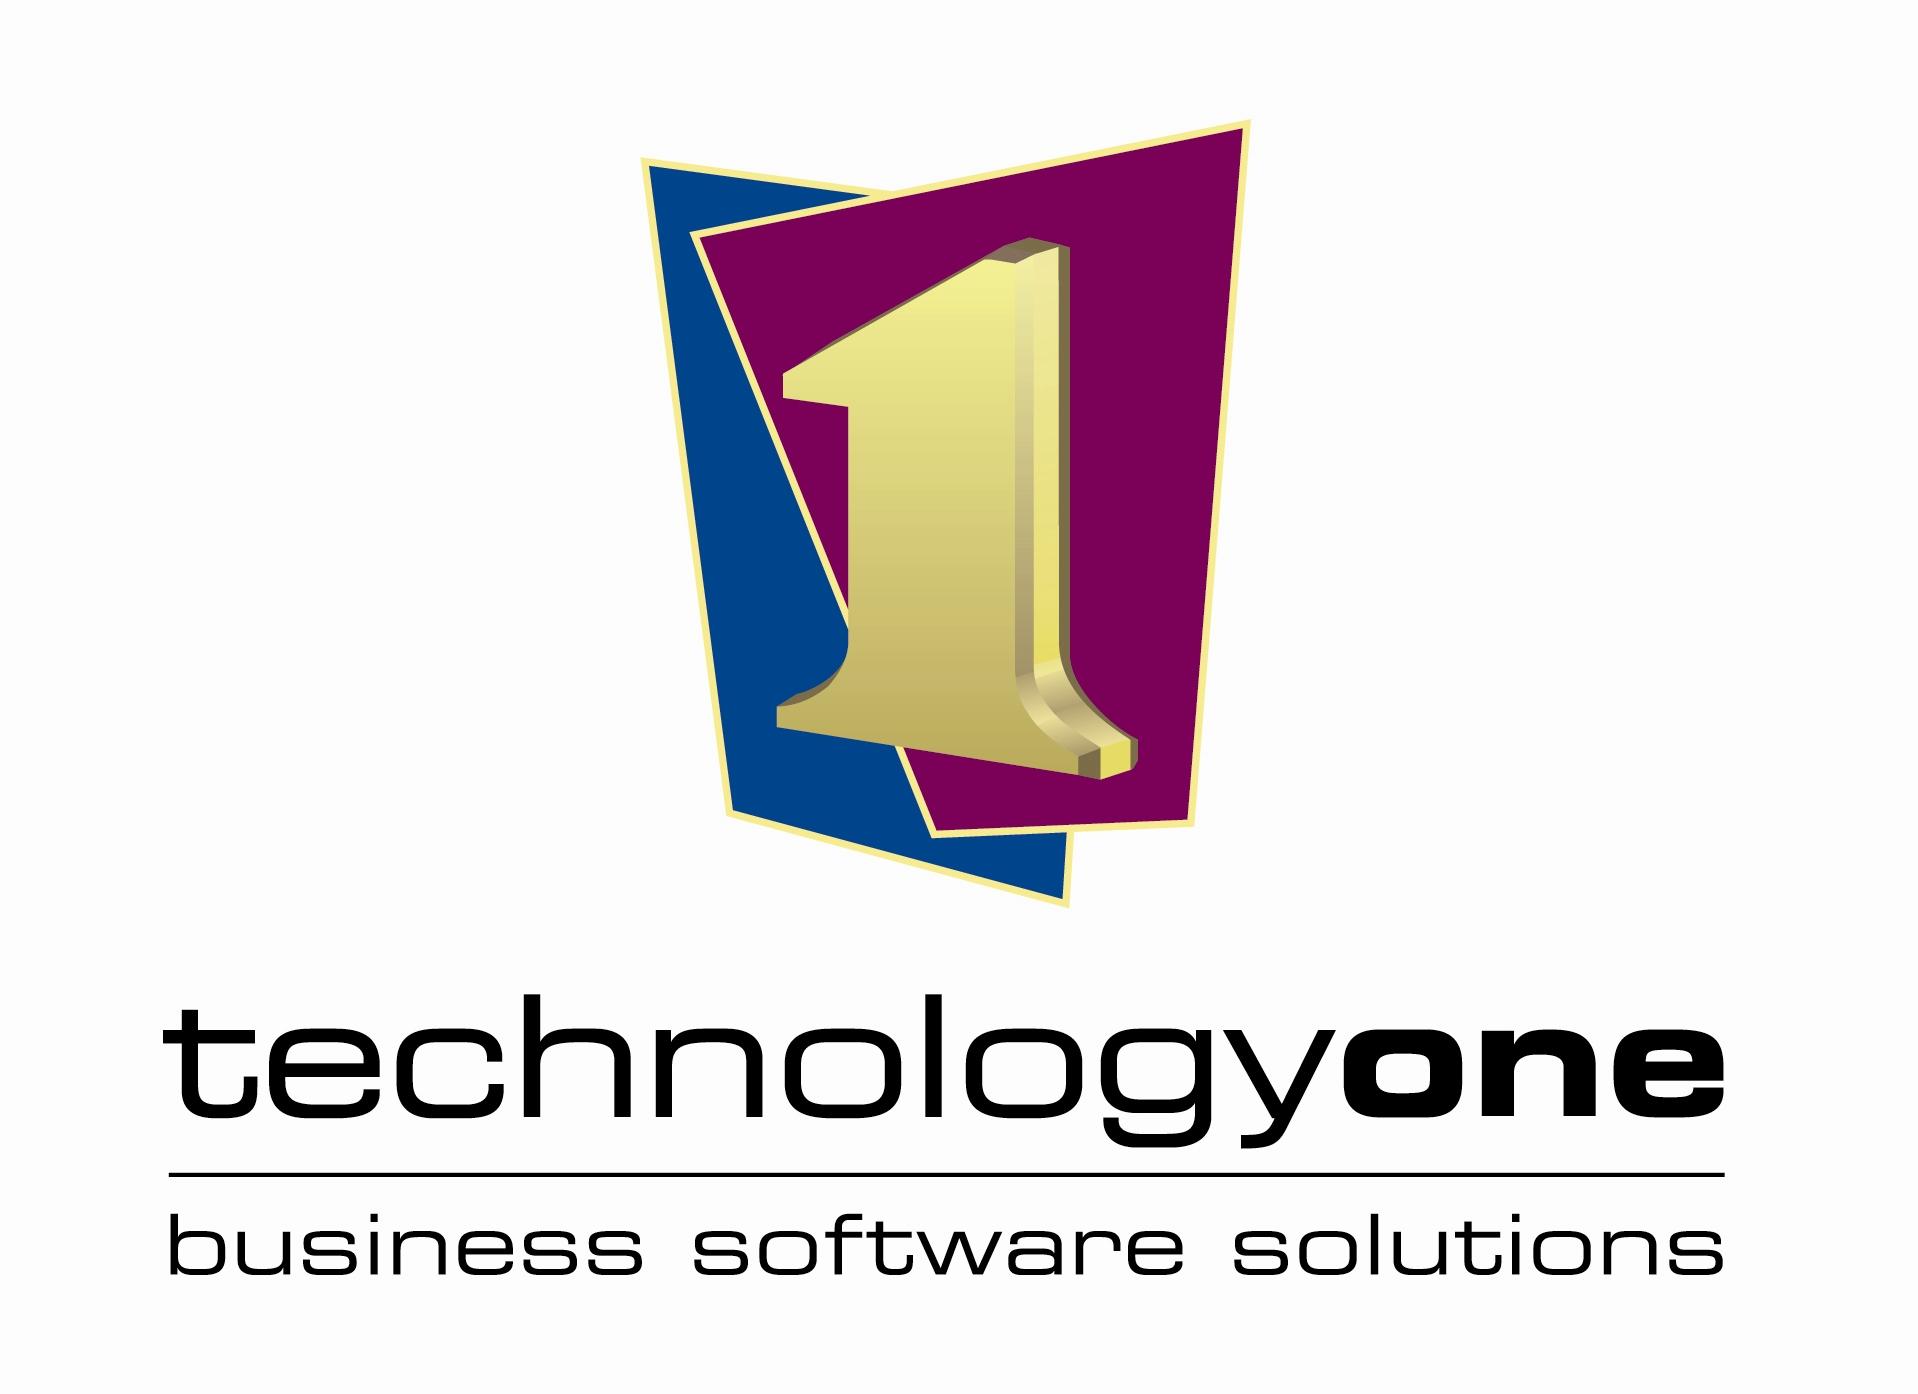 Technology One Logo